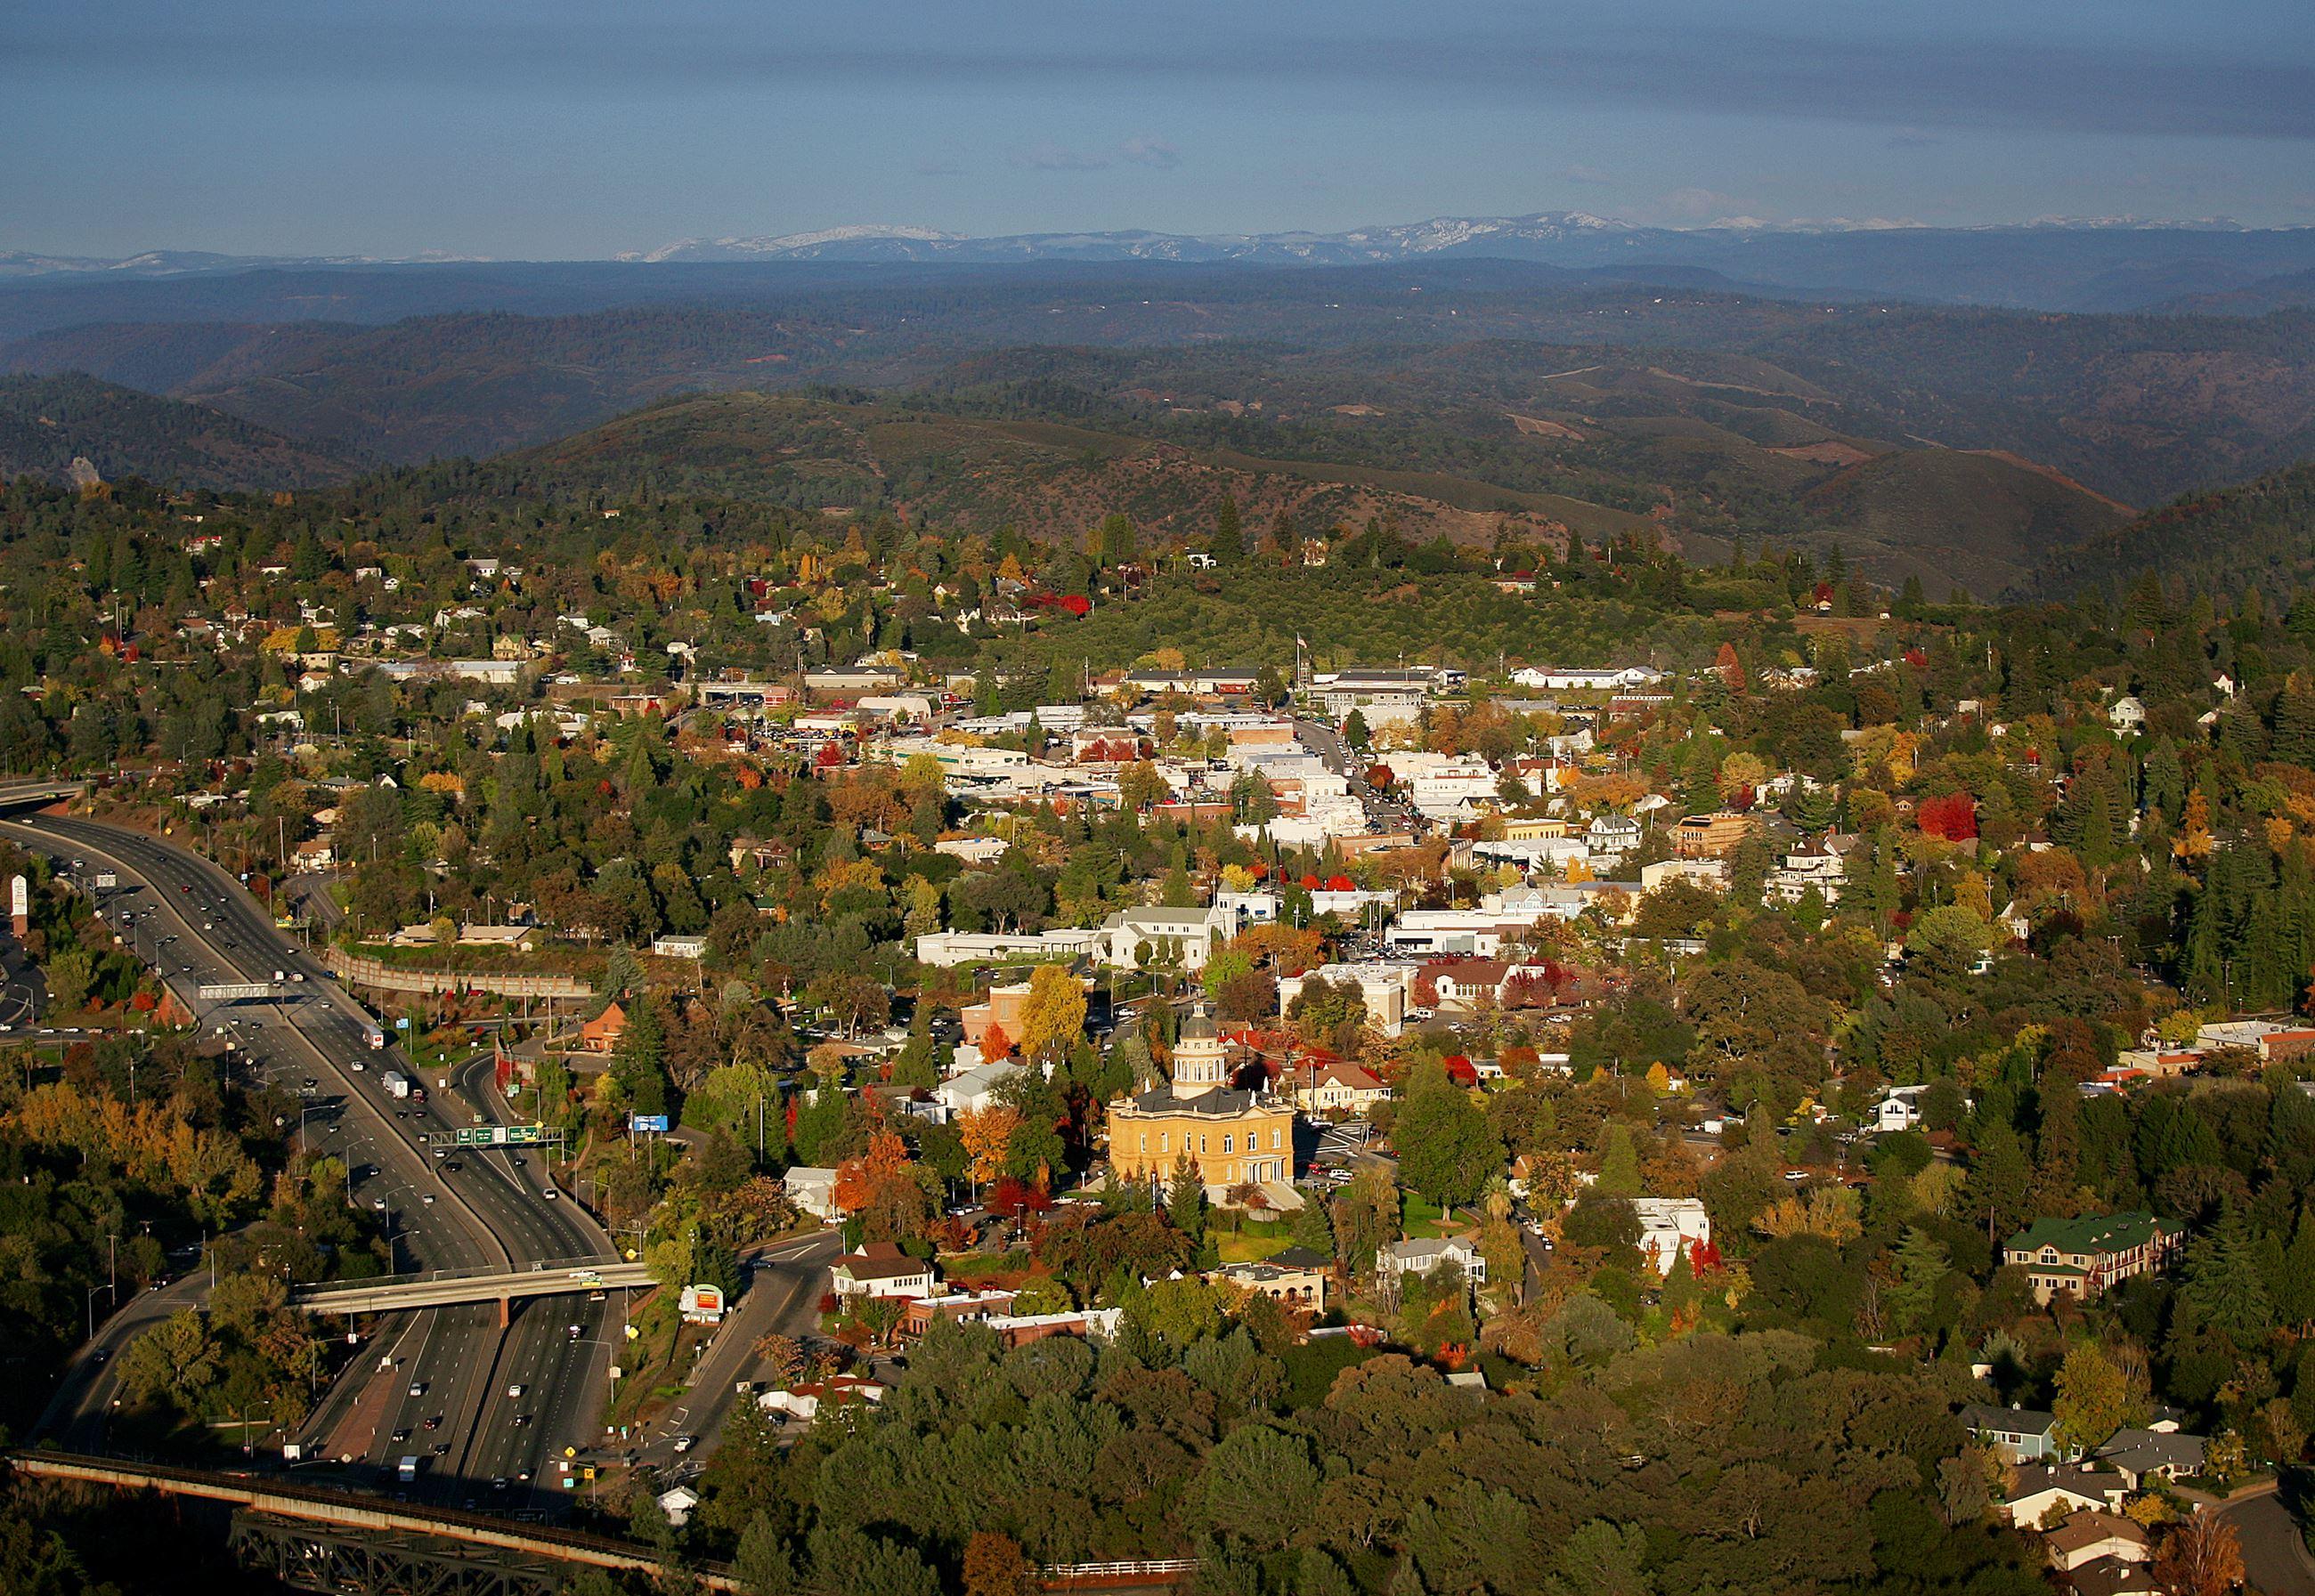 Images of Auburn | 2600x1793